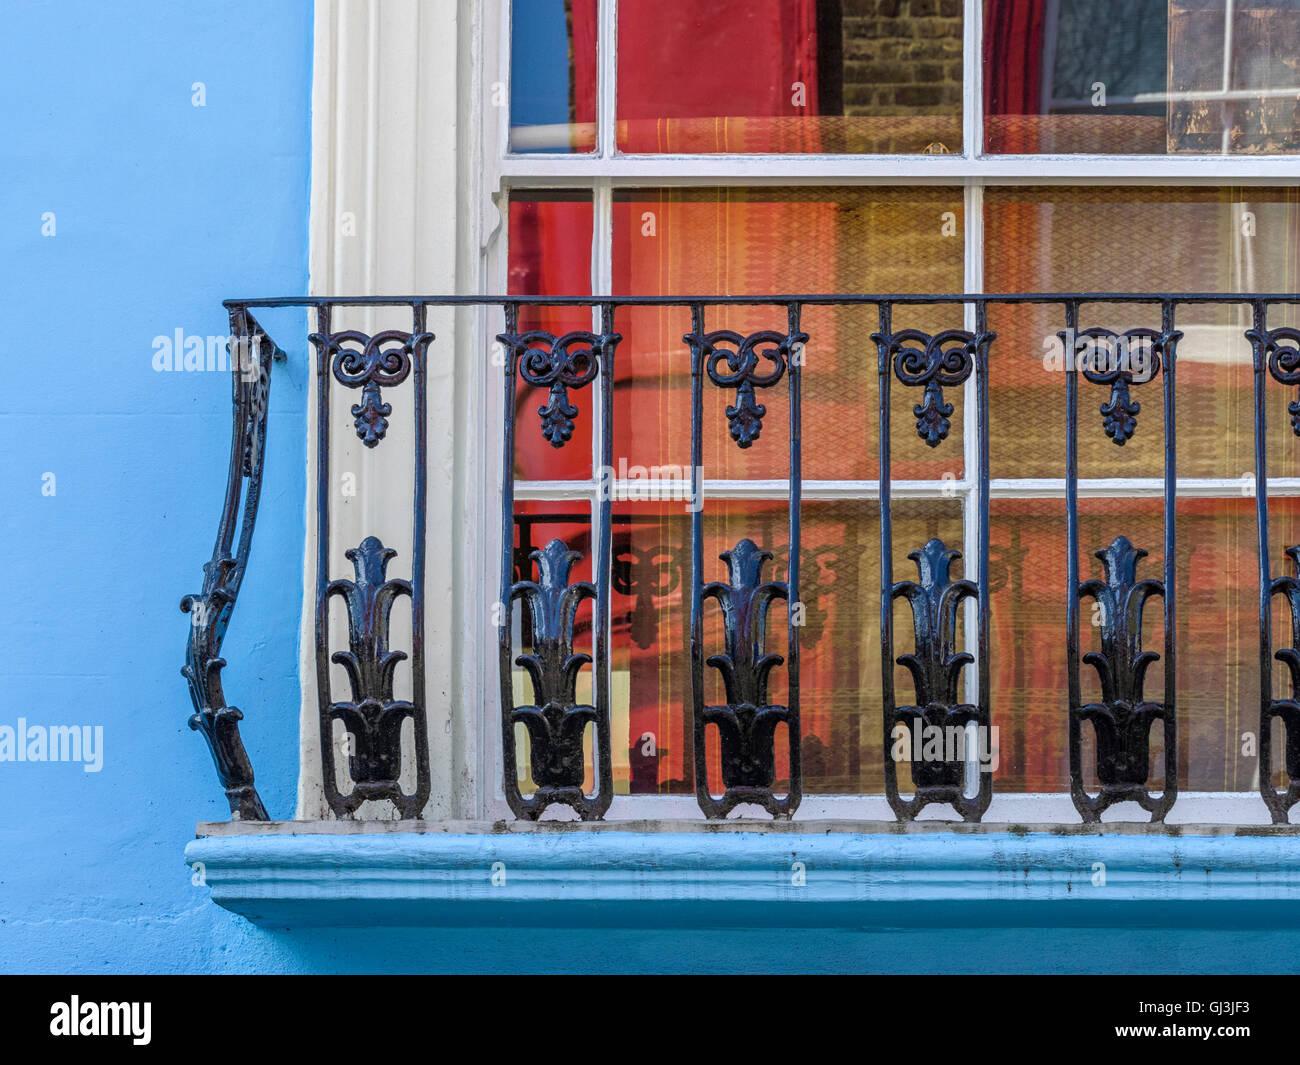 Notting Hill Apartments, London England Stock Photo, Royalty Free ...